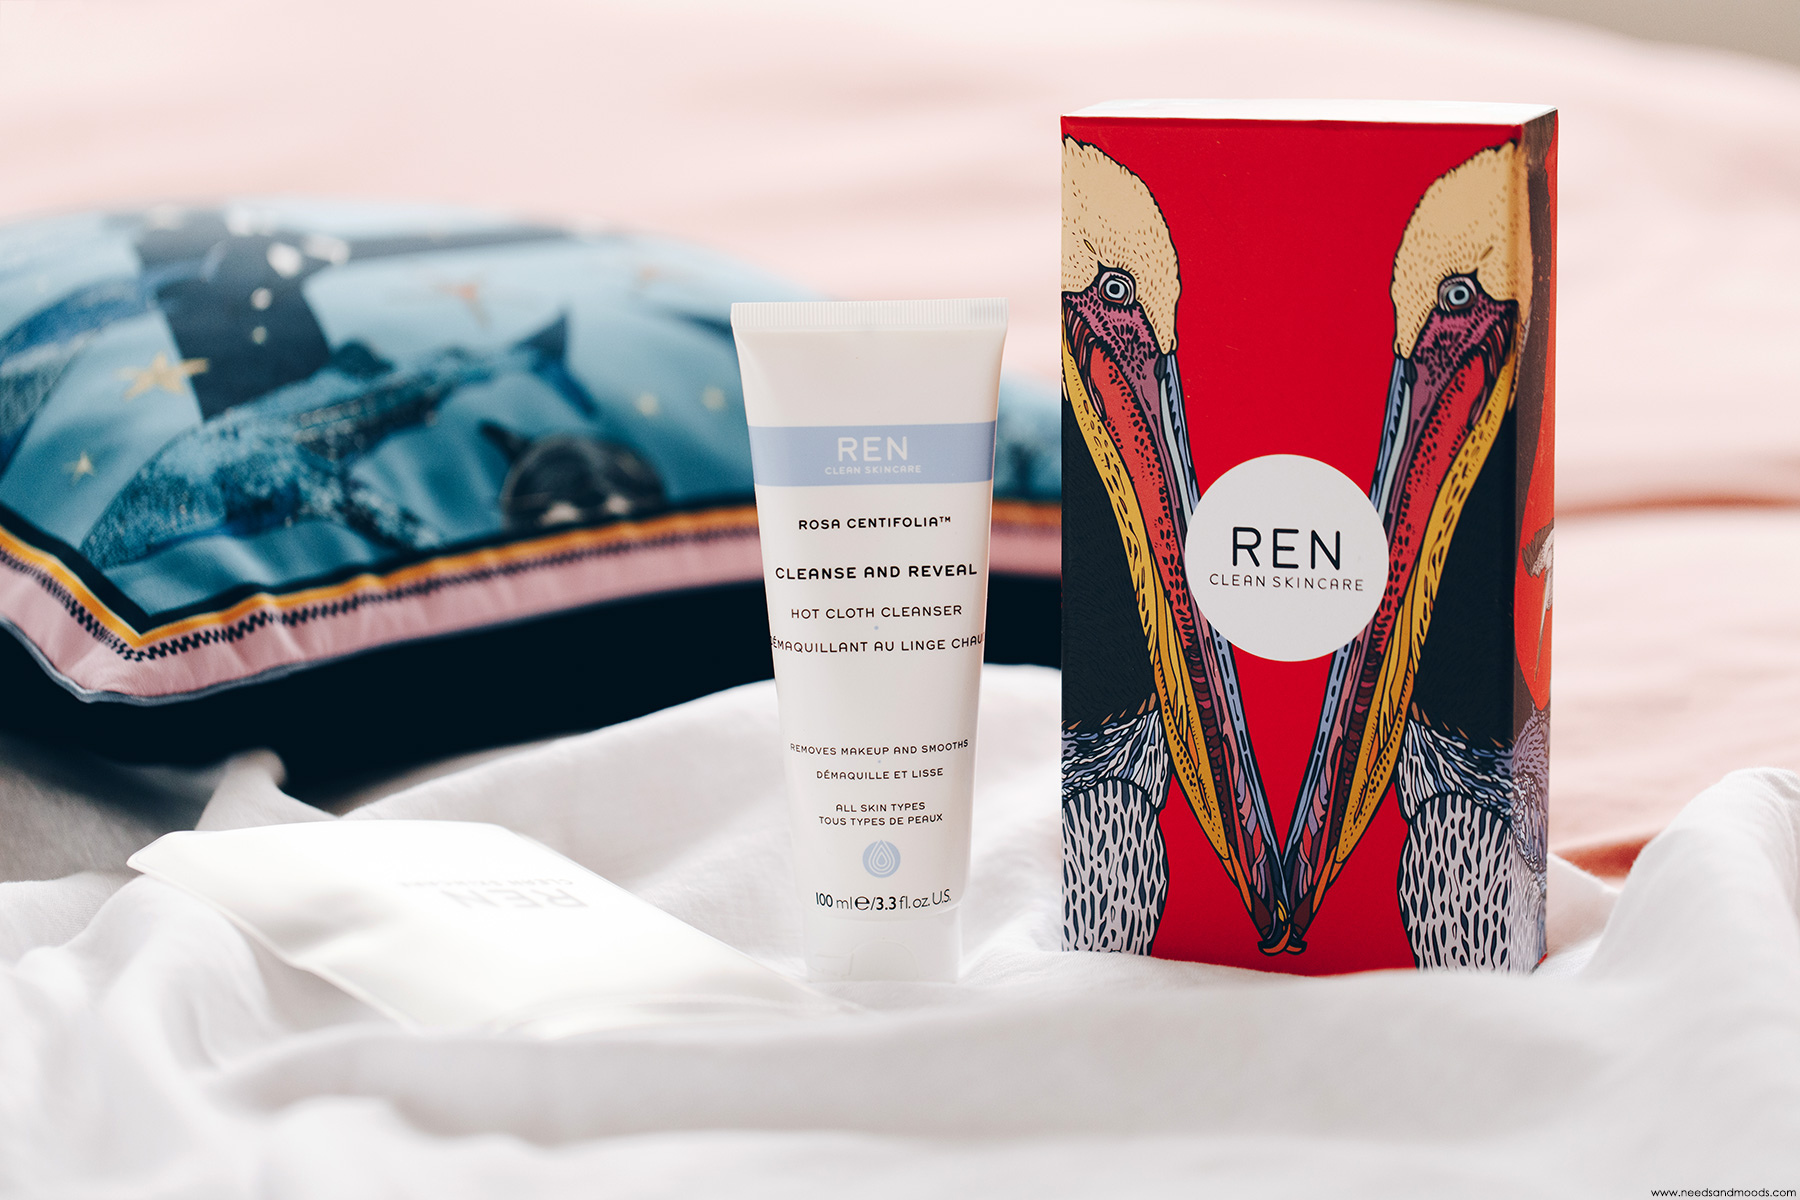 ren rosa centifolia cleanse reveal hot cloth cleanser